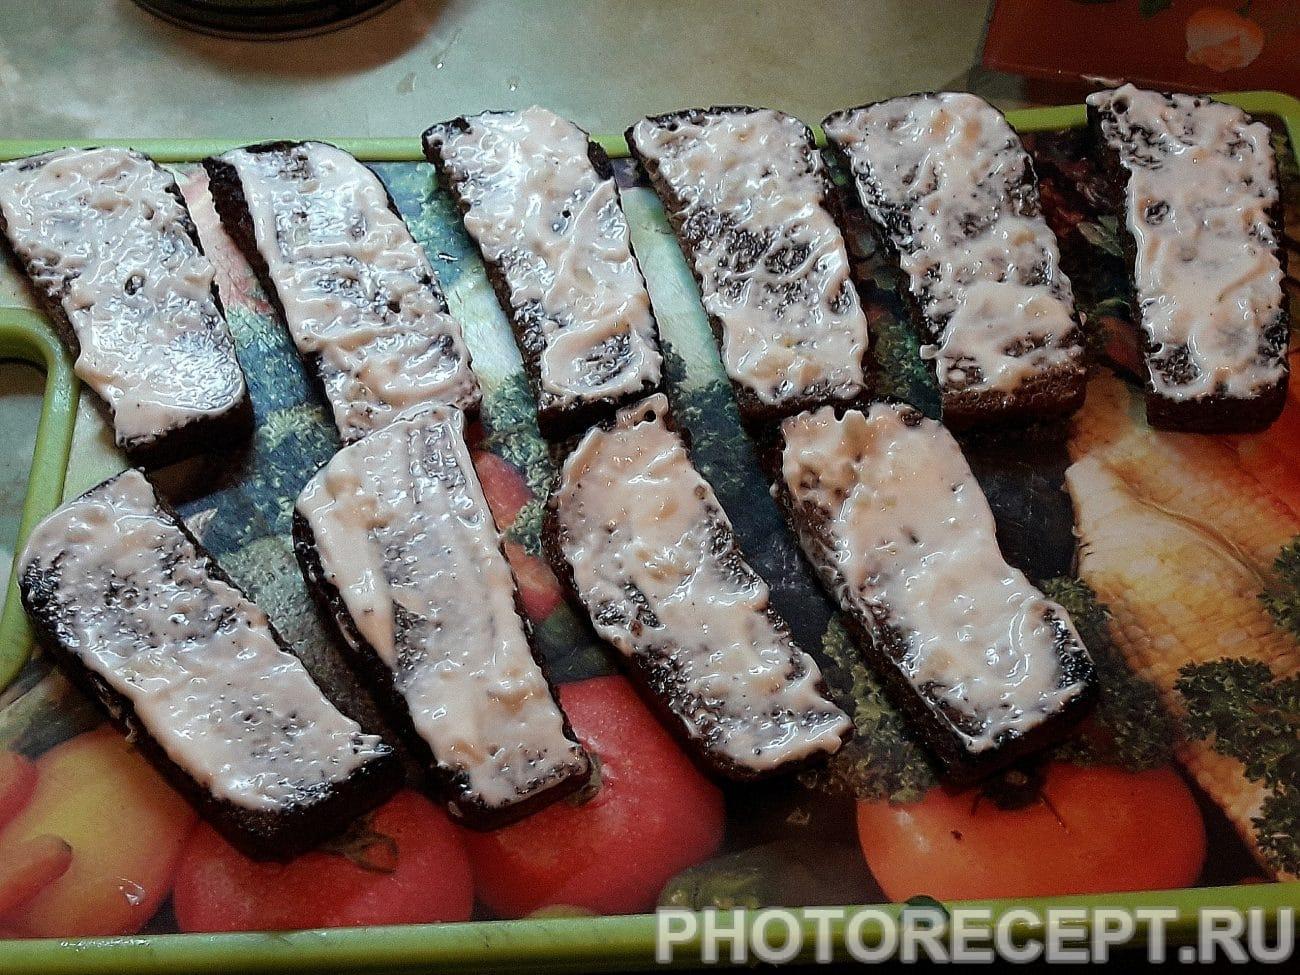 Бутерброд со шпротами пошаговый рецепт